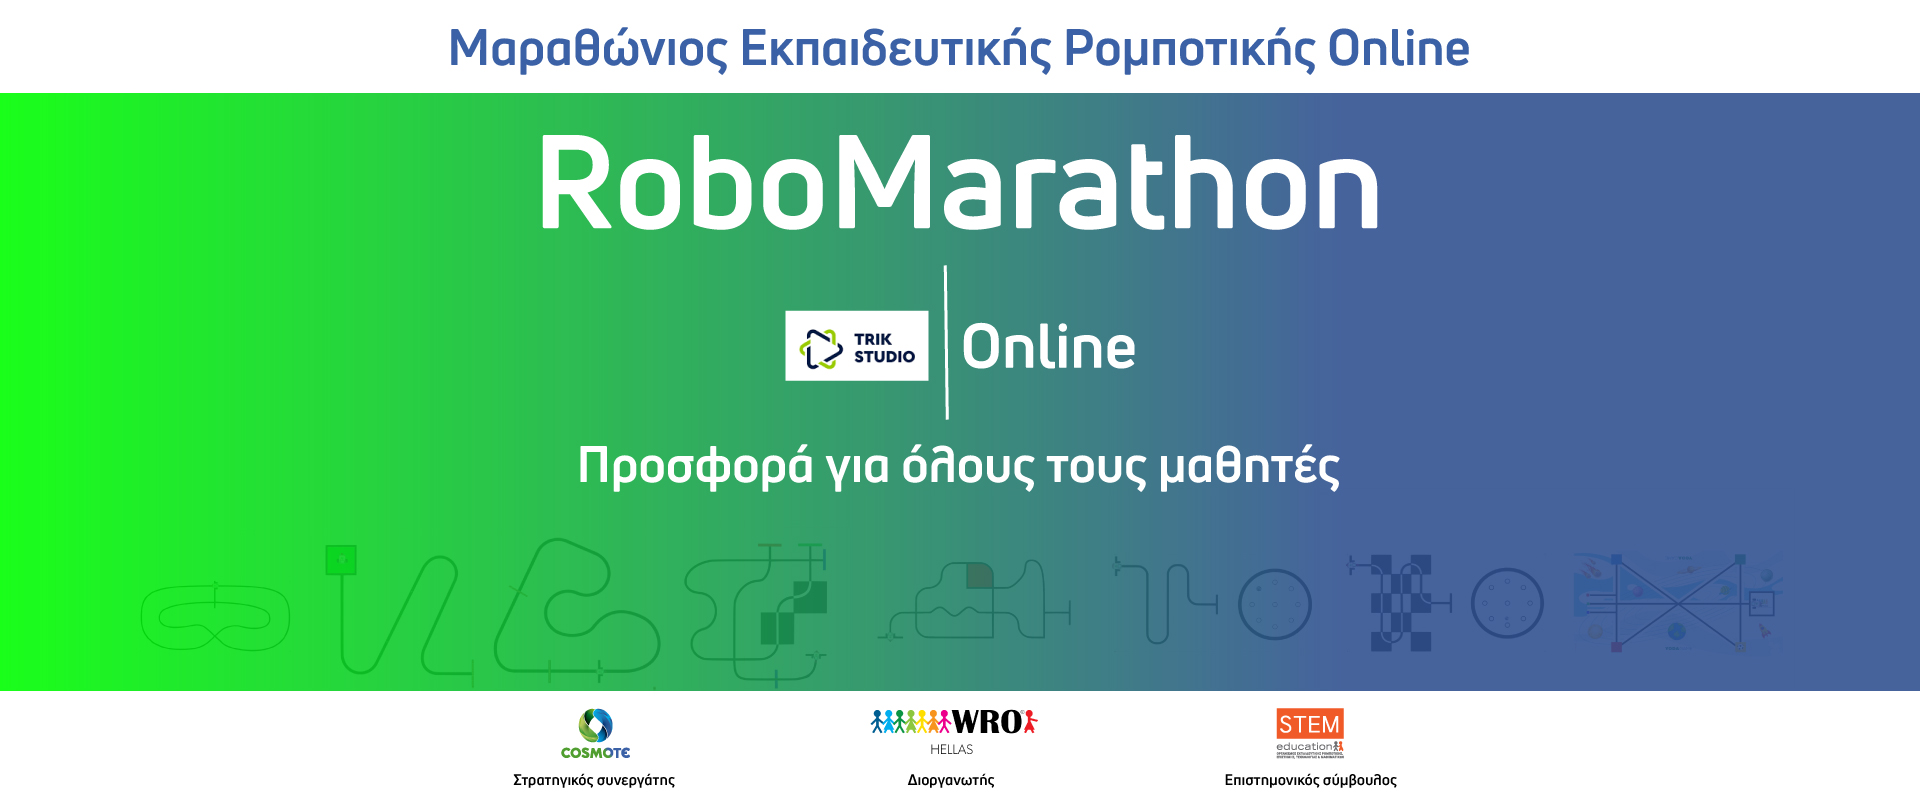 RoboMarathon